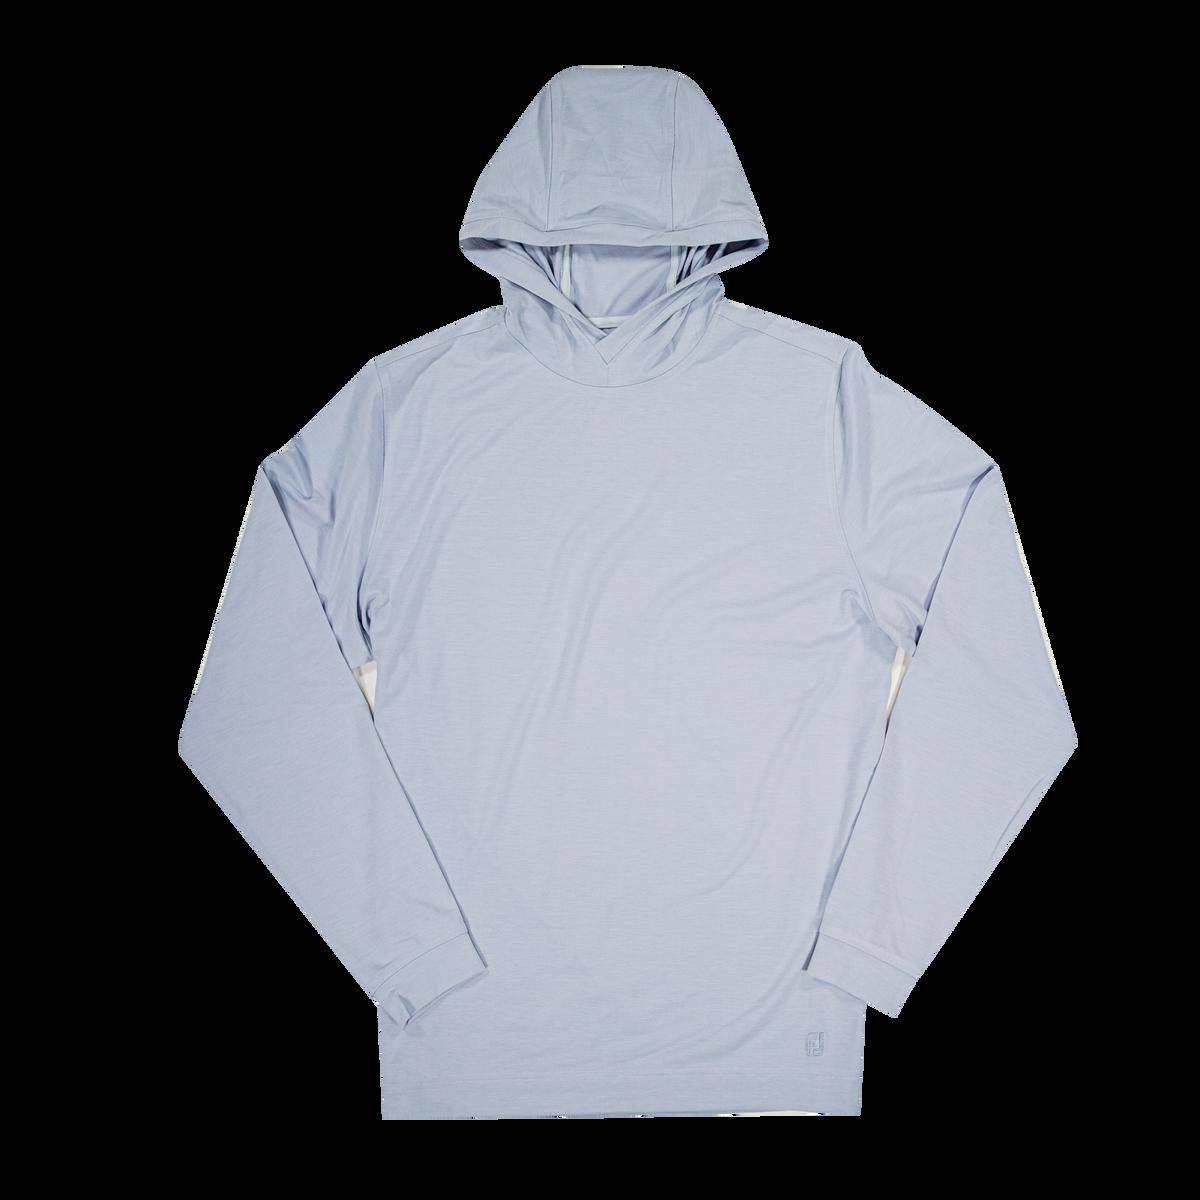 Coastal Collection Lightweight Jersey Hoodie